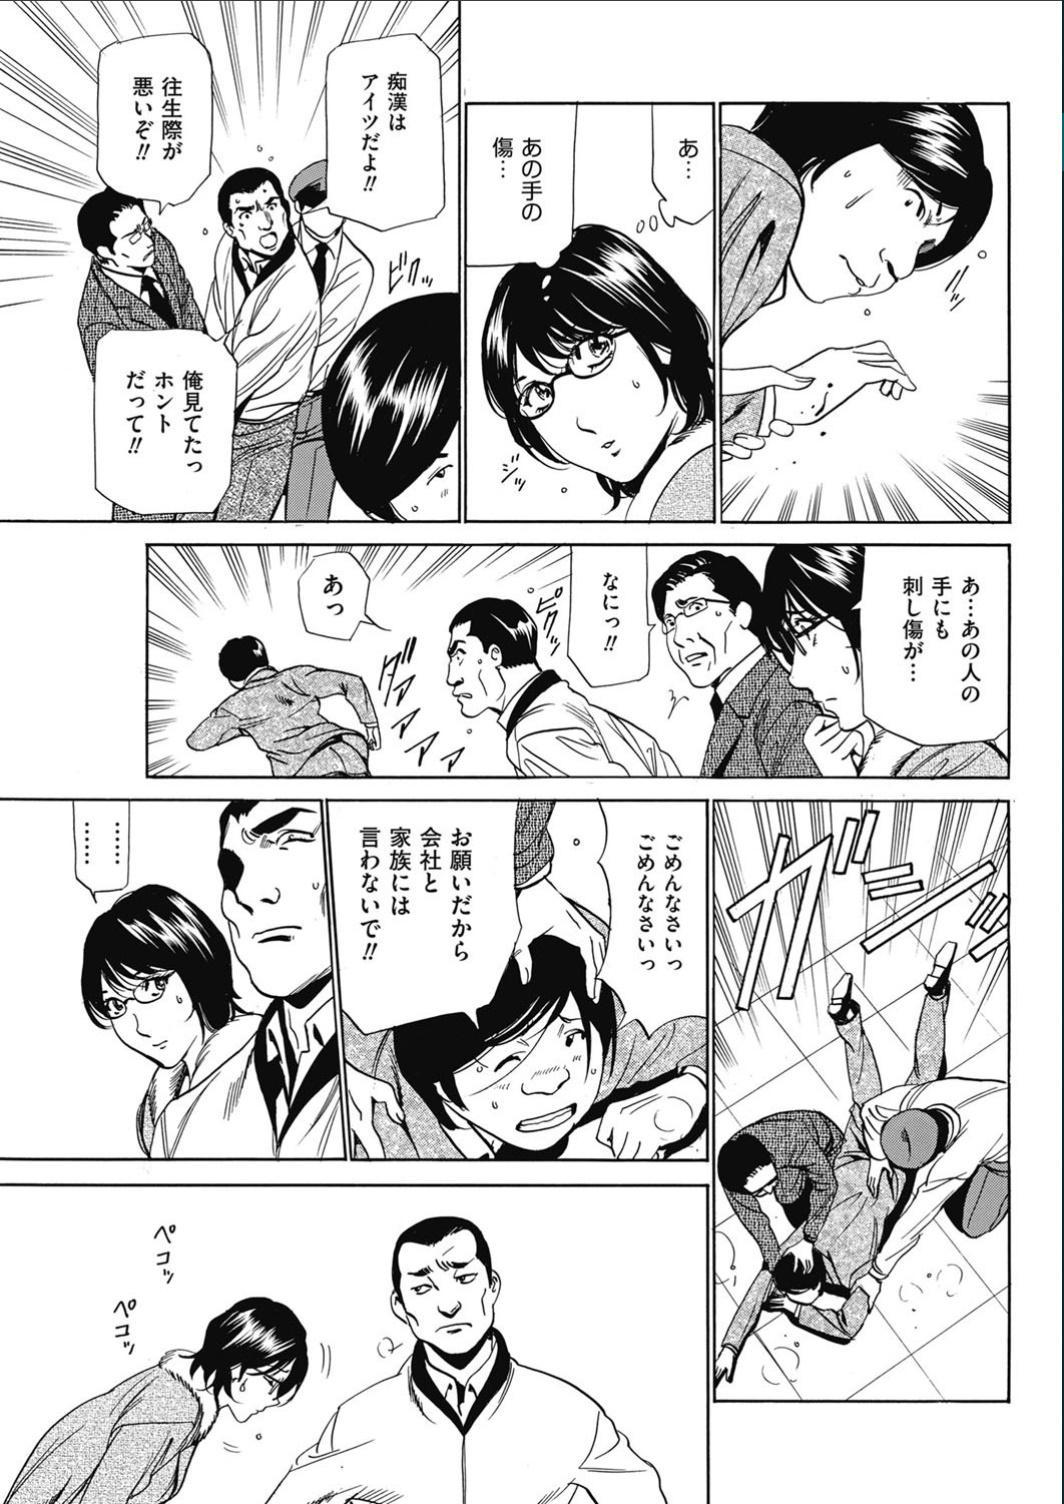 Wa Usuki Ipa a 1-10 95